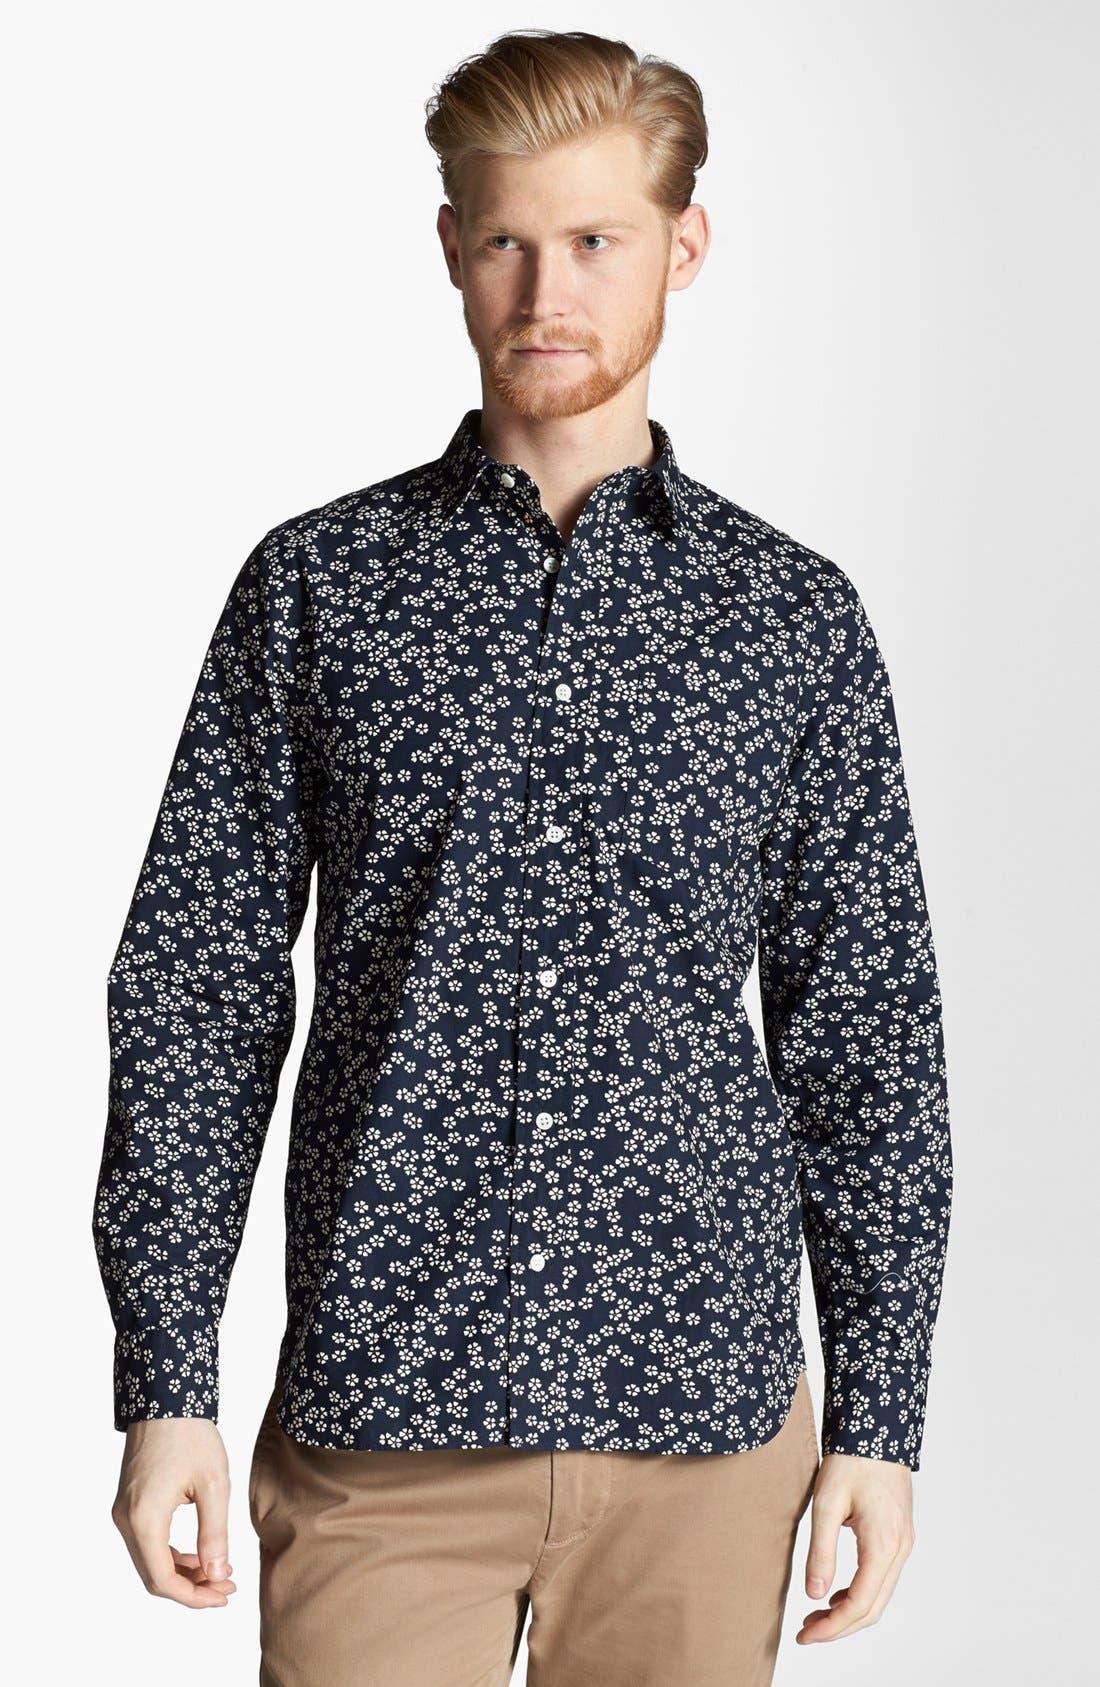 Alternate Image 1 Selected - Jack Spade 'Foley' Floral Print Woven Shirt